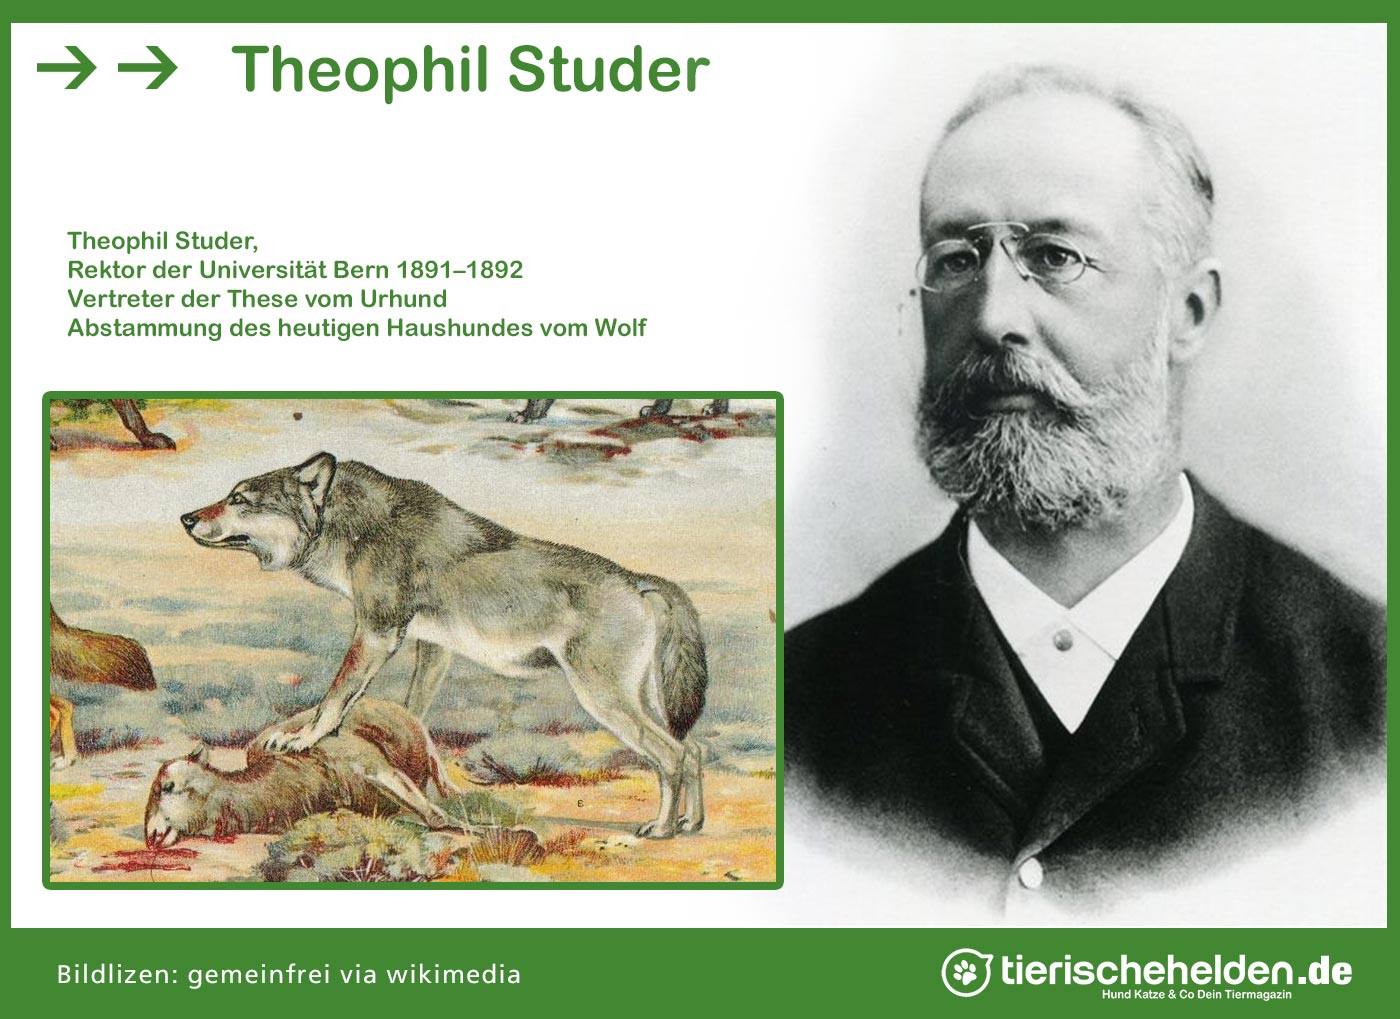 Theophil Studer